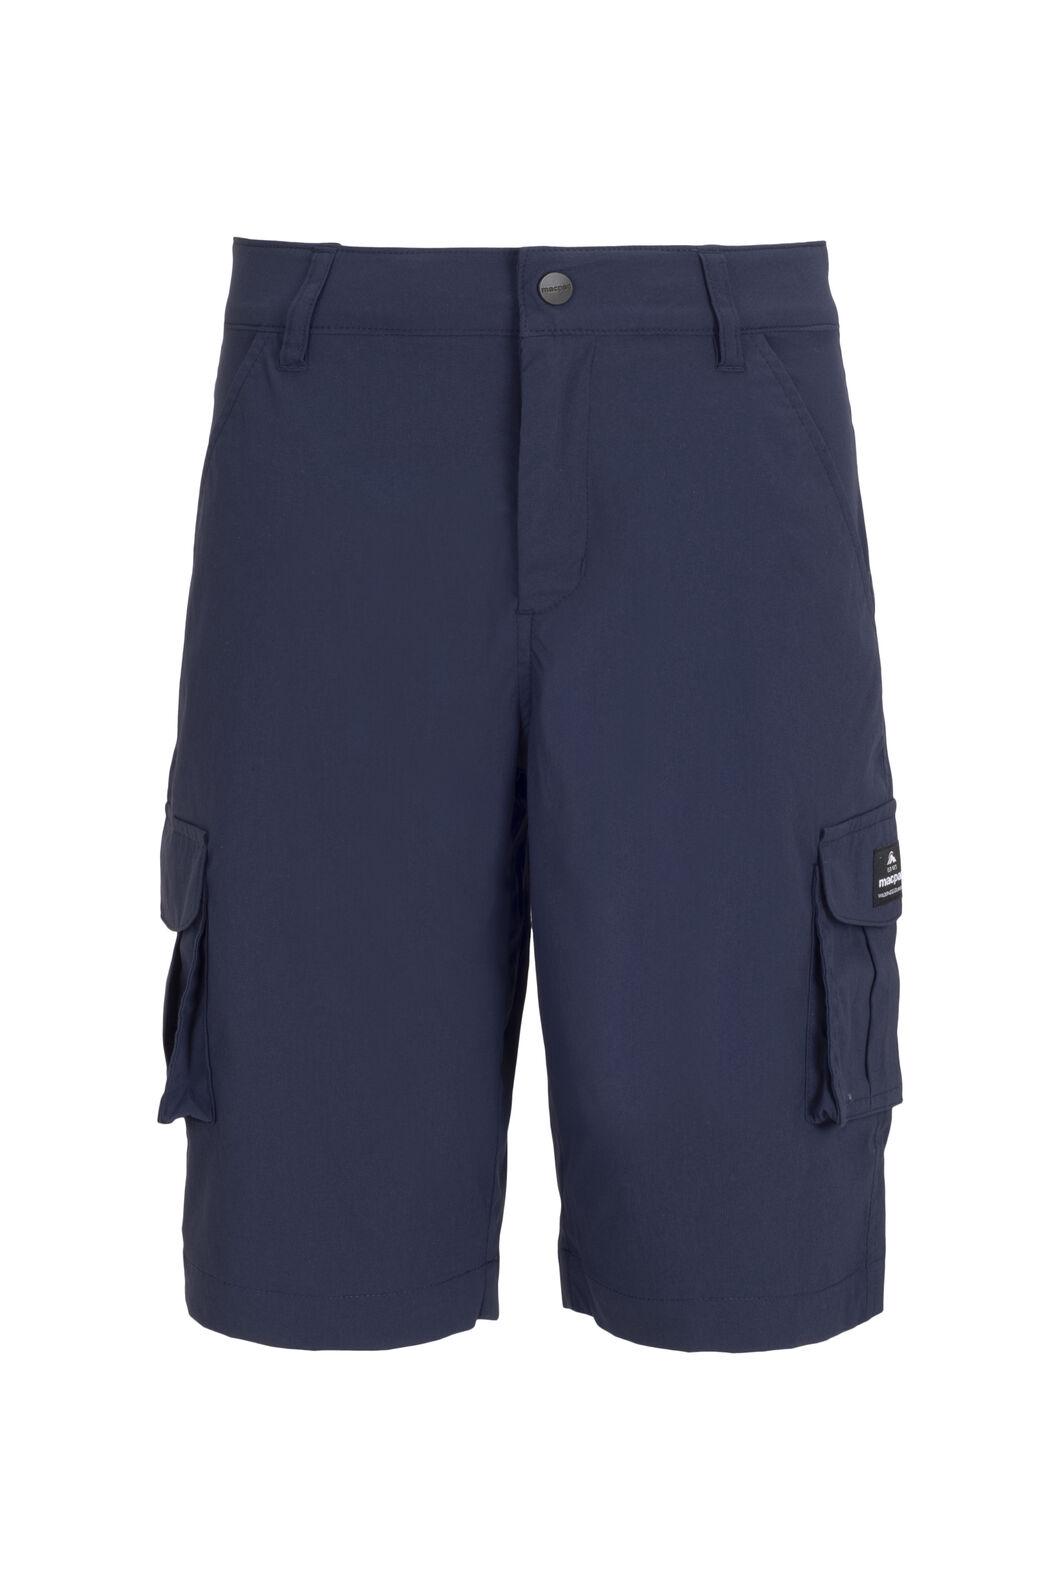 Macpac Lil' Drifter Shorts — Kids', Black Iris, hi-res